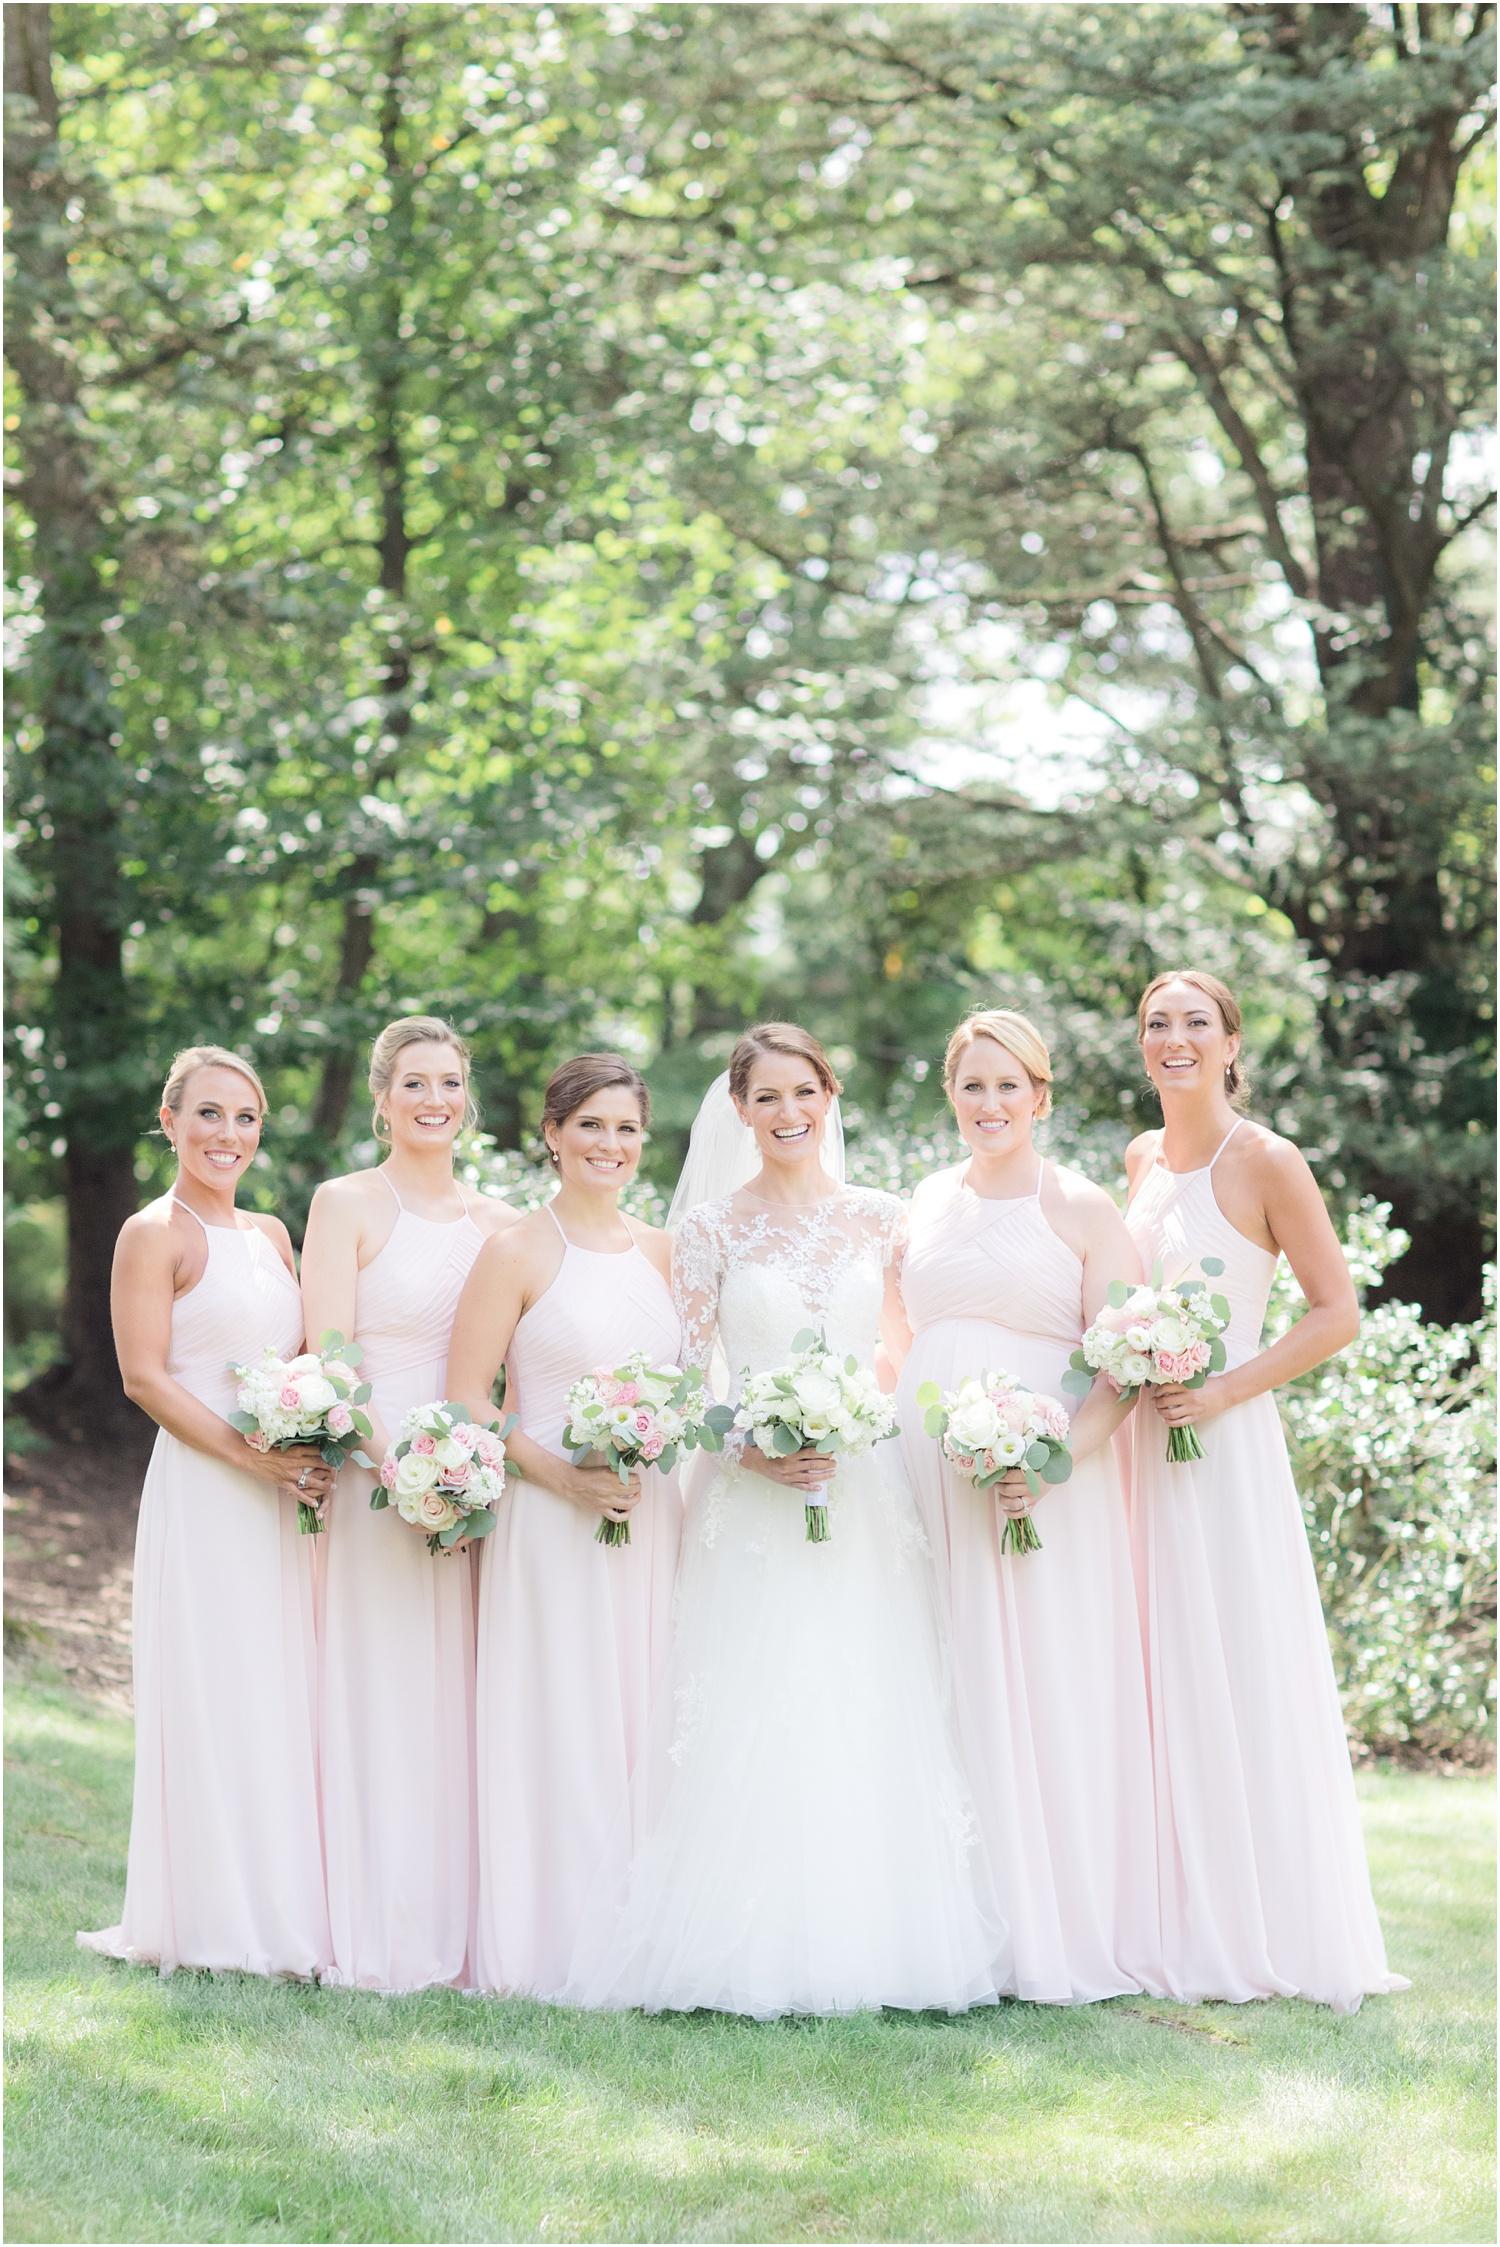 Copy of Bridesmaid photo in Short Hills, NJ.